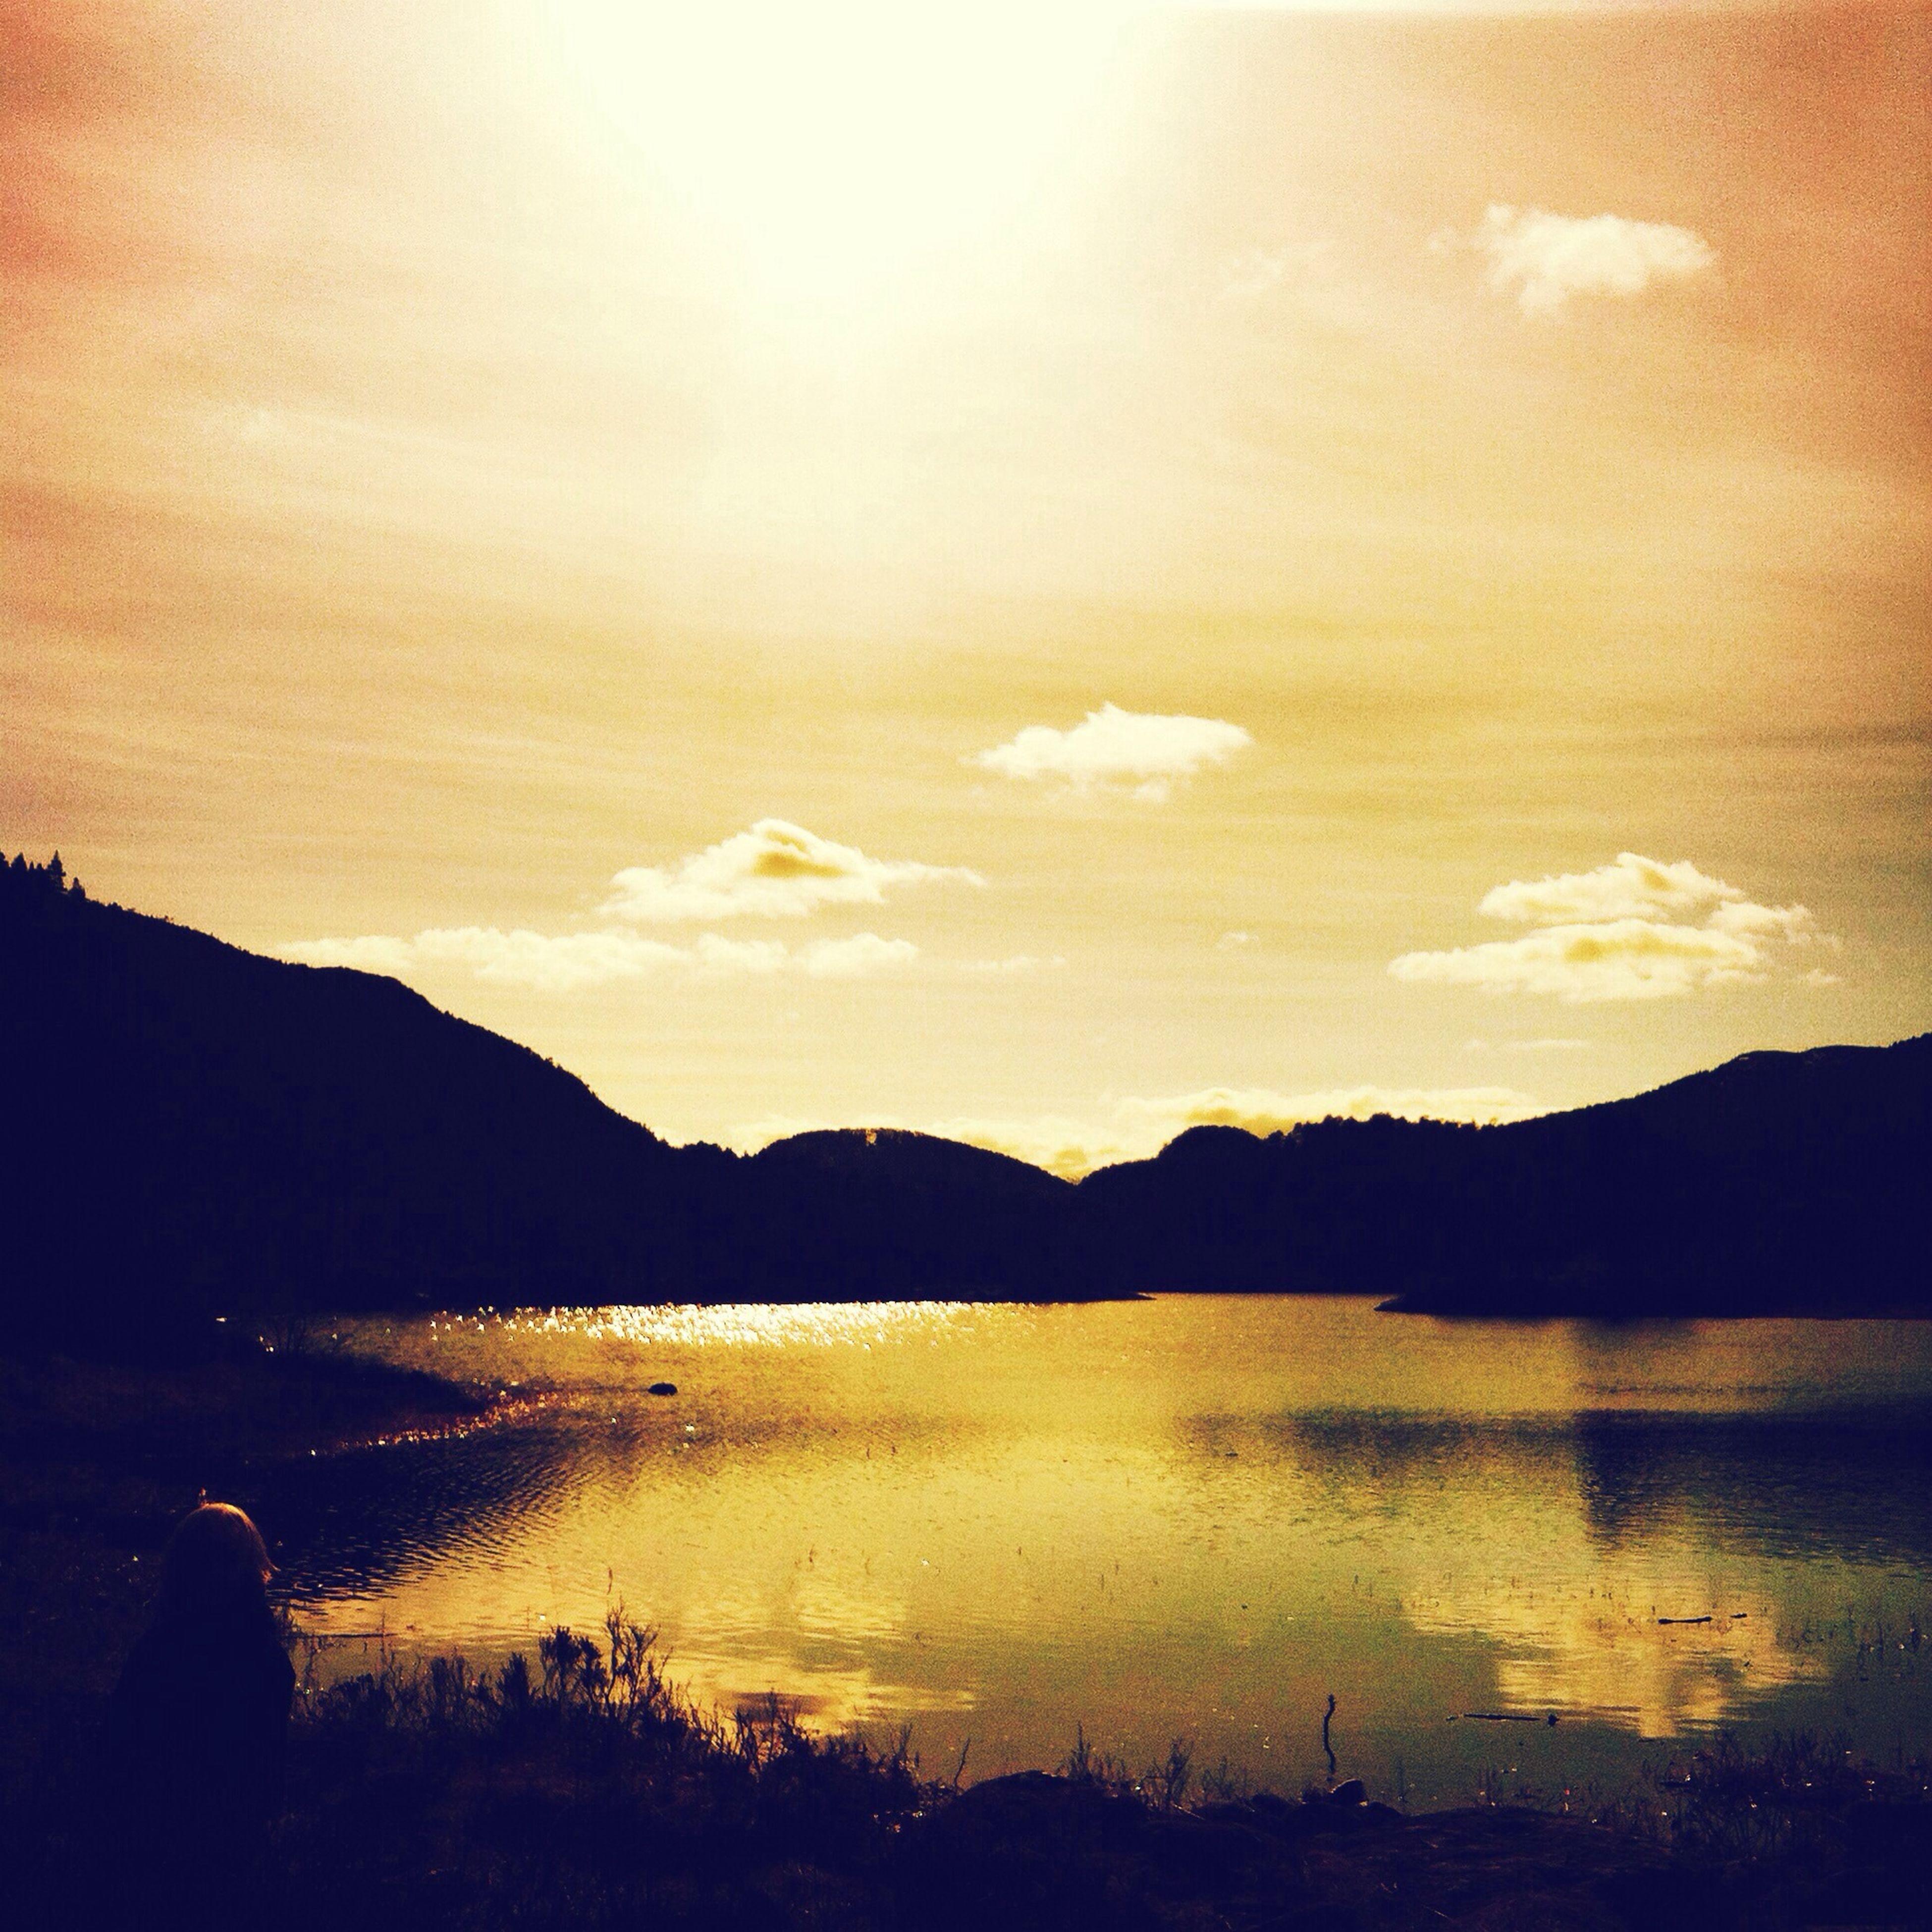 water, mountain, sunset, silhouette, lake, tranquil scene, scenics, tranquility, reflection, beauty in nature, mountain range, sky, sun, nature, idyllic, lakeshore, sunlight, outdoors, non-urban scene, calm